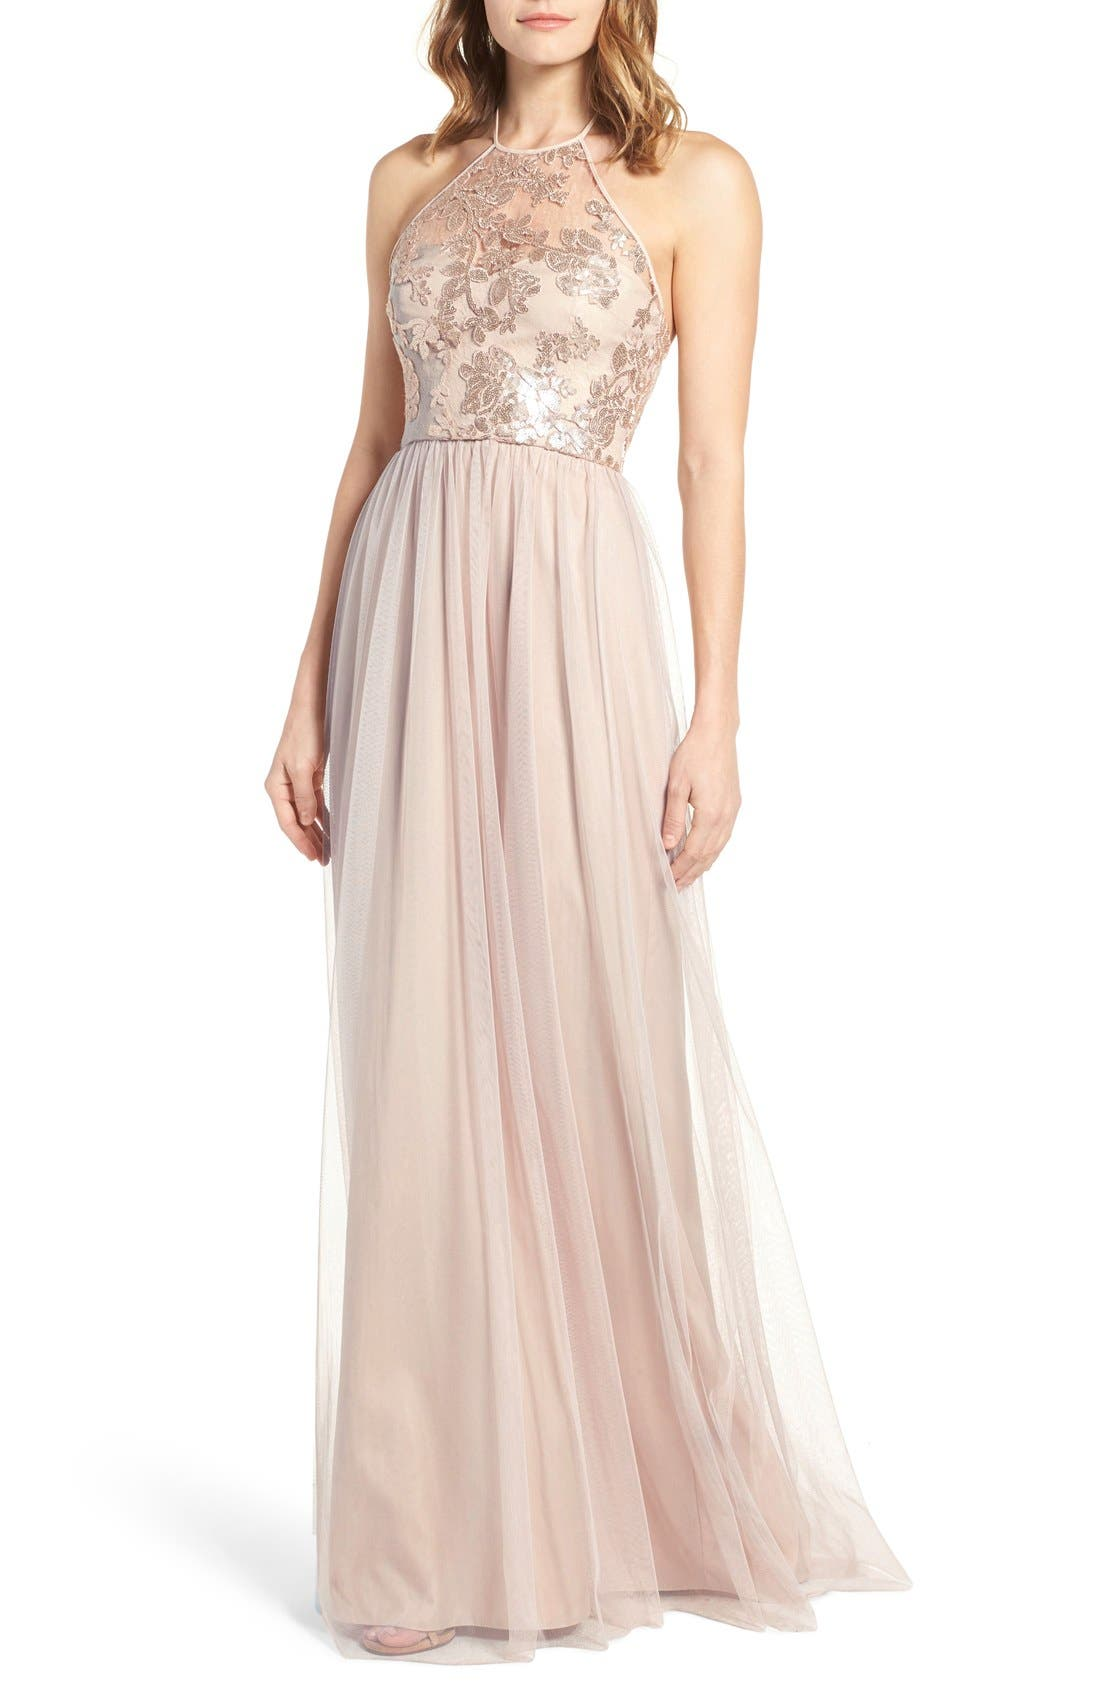 Sheridan Sequin Halter Dress,                         Main,                         color, LATTE